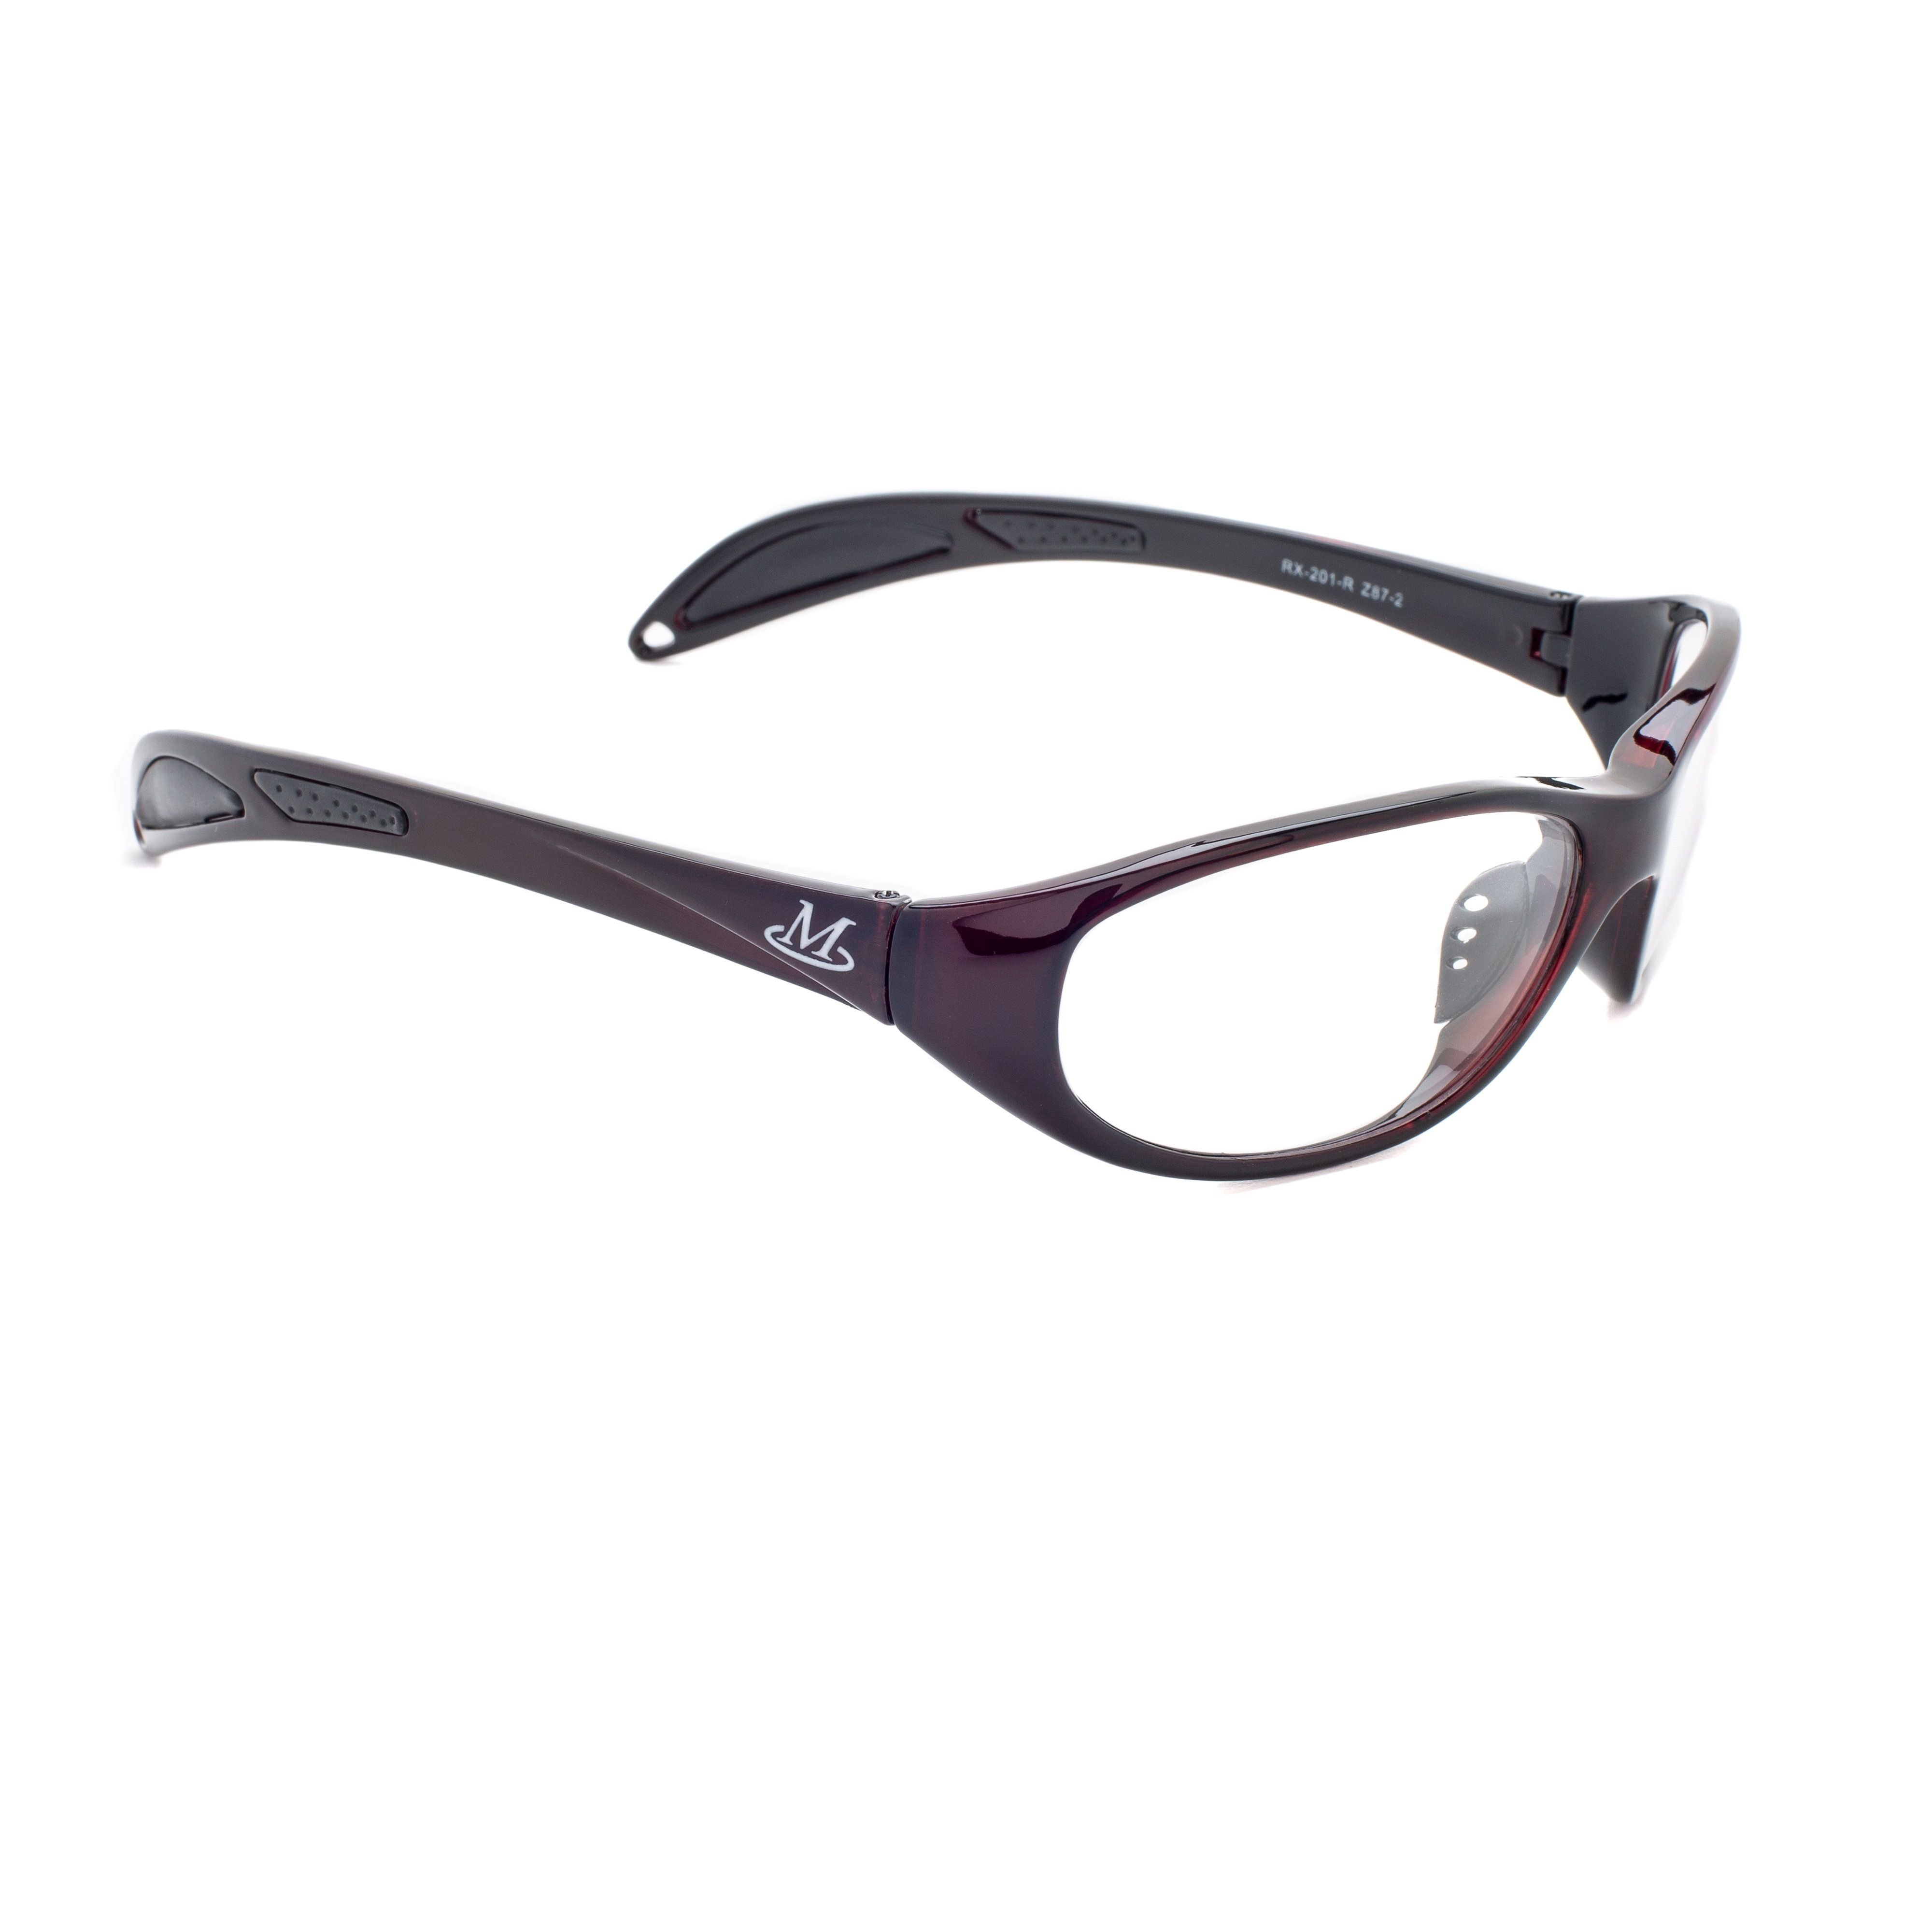 d9ba83fcced29 Prescription Safety Glasses RX-201 - Prescription Safety Glasses